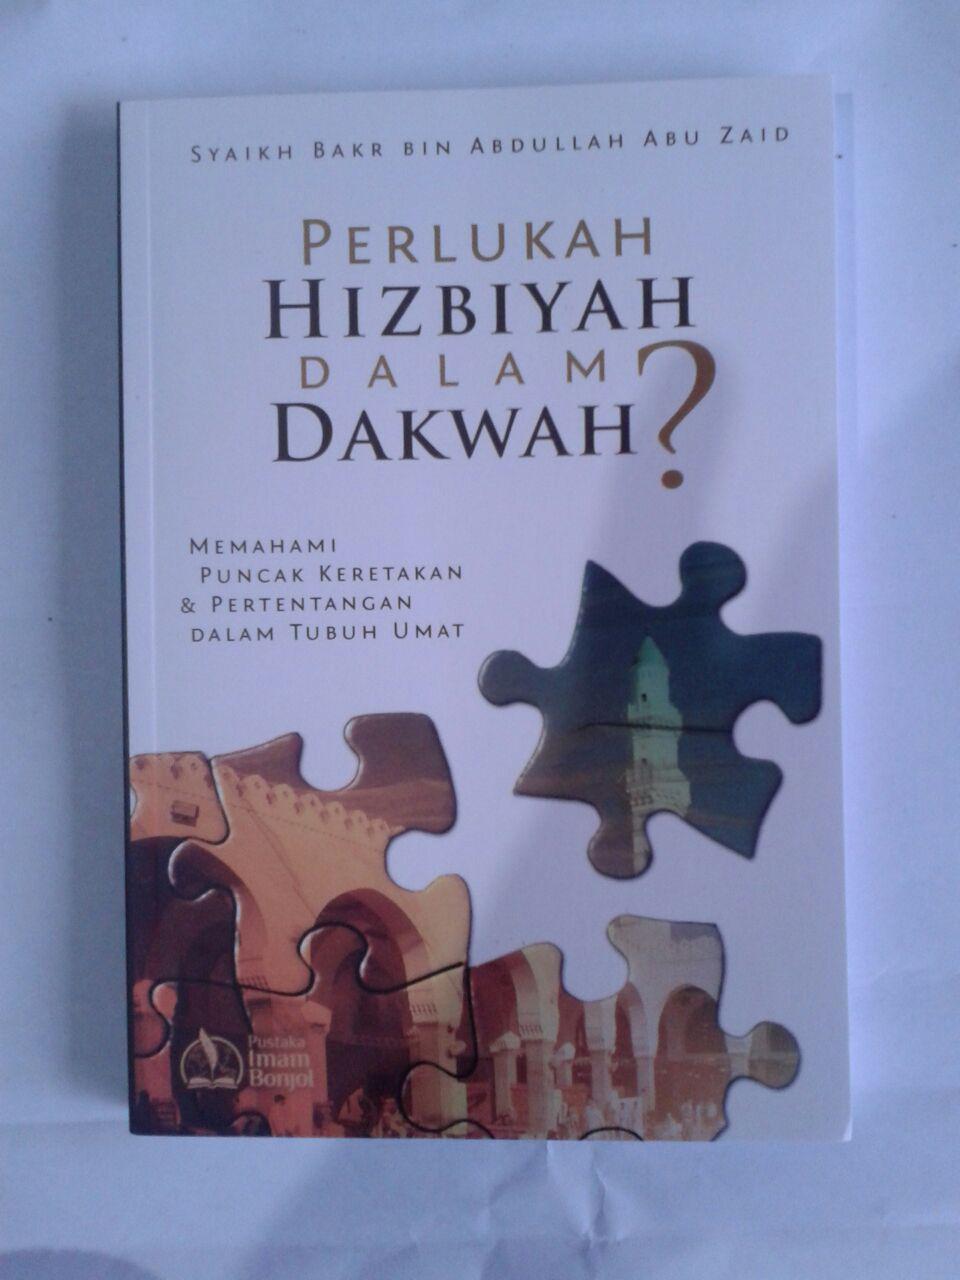 Buku Perlukan Hizbiyah Dalam Dakwah cover 3